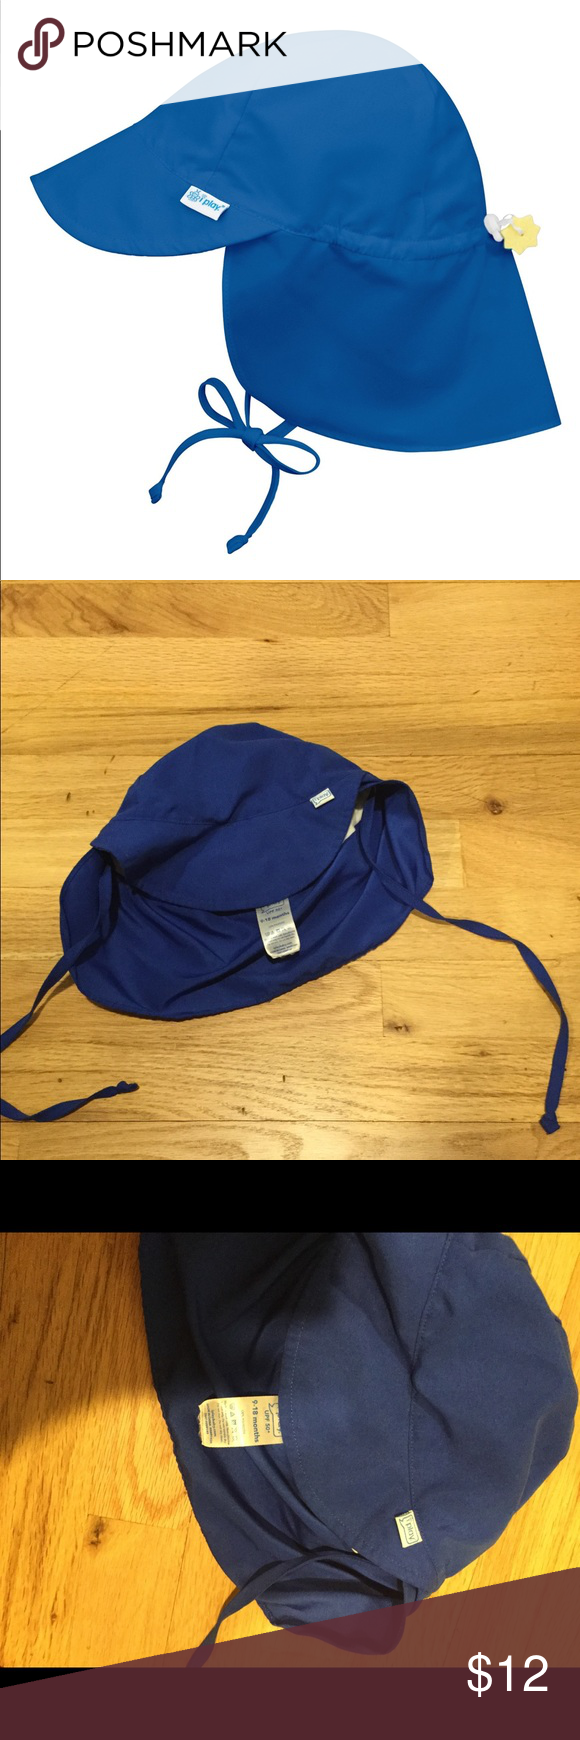 a97e3a67a6c Iplay baby boys blue floppy sun hat UPF 50 Color  Royal Blue Size  9 ...